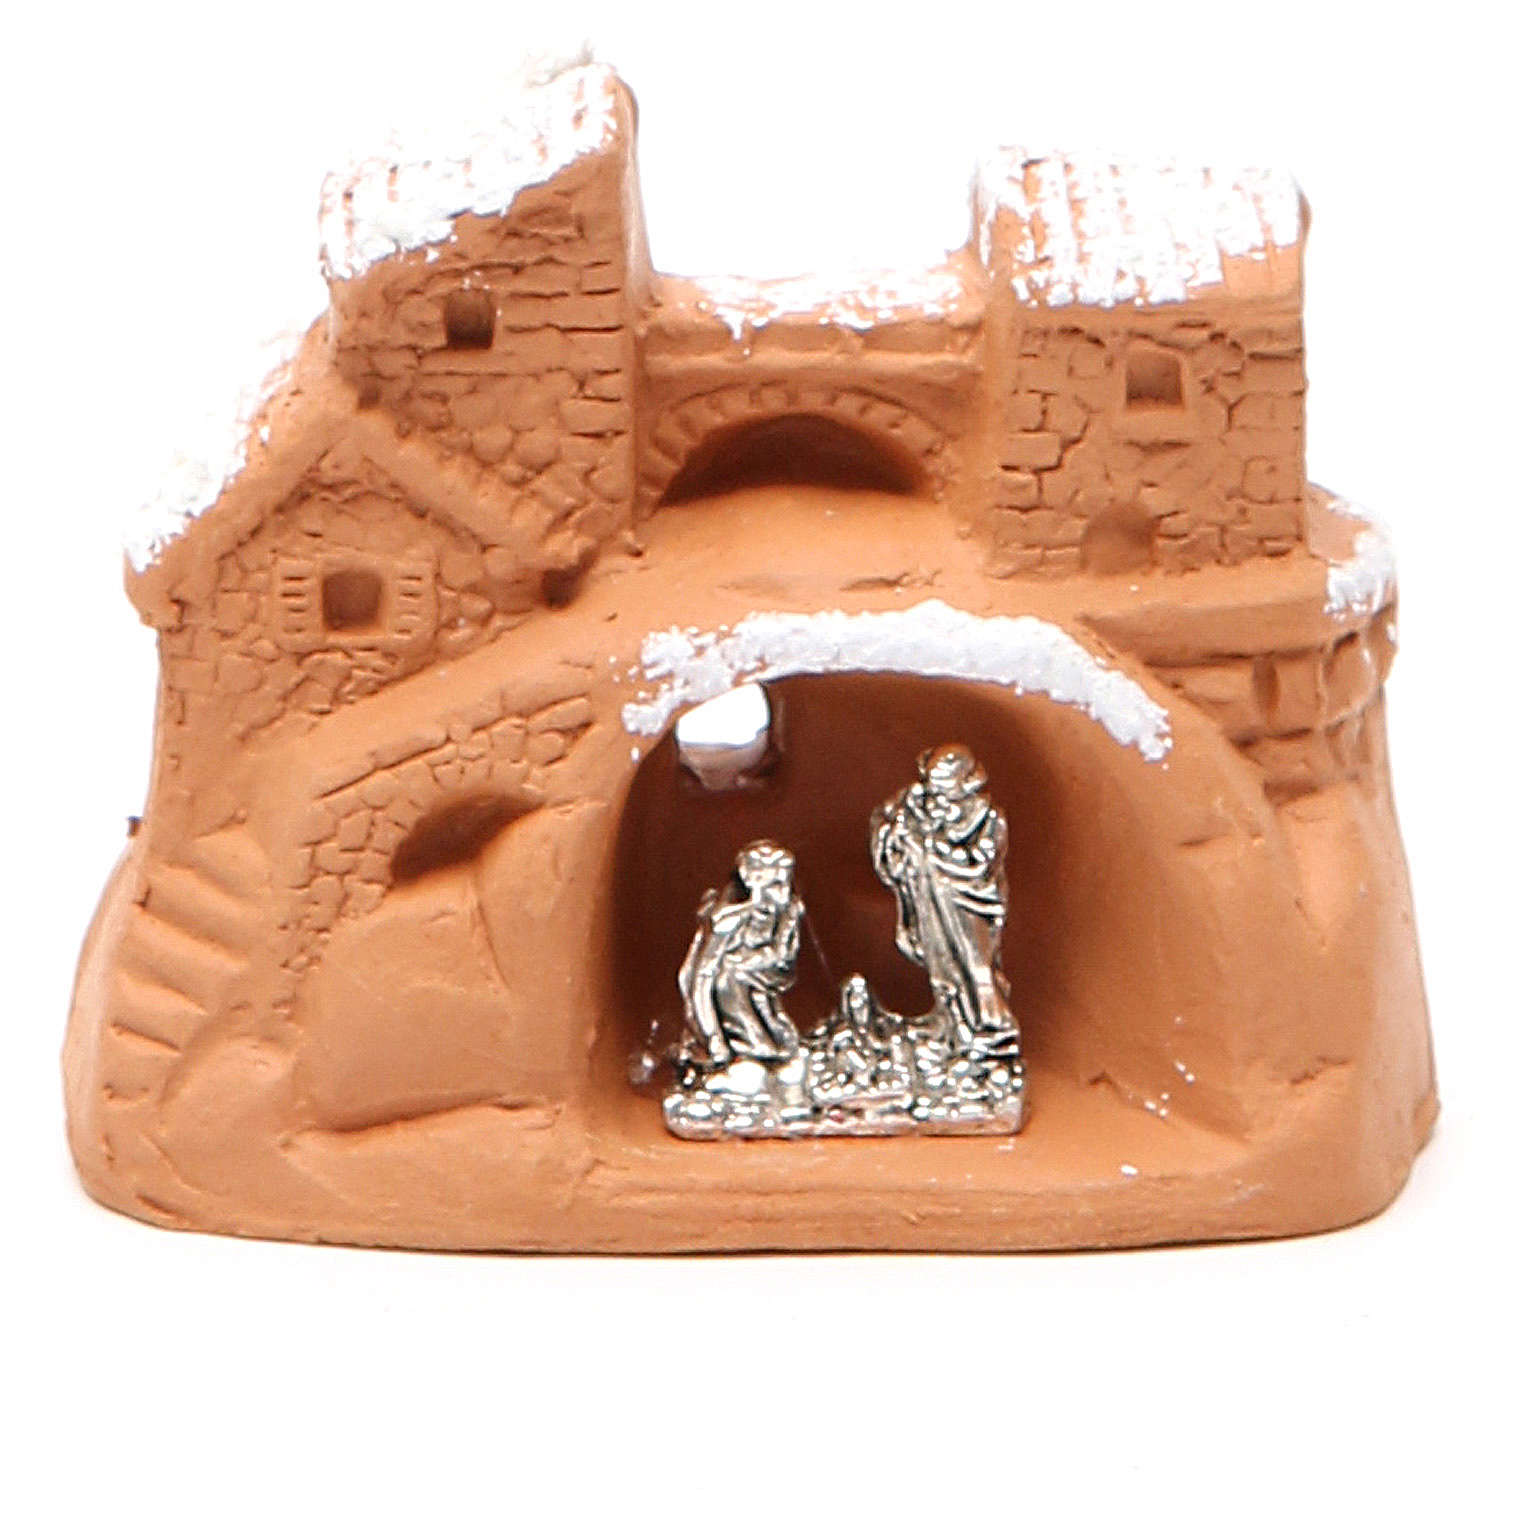 Miniature Nativity terracotta and snow 6x7x4cm 4